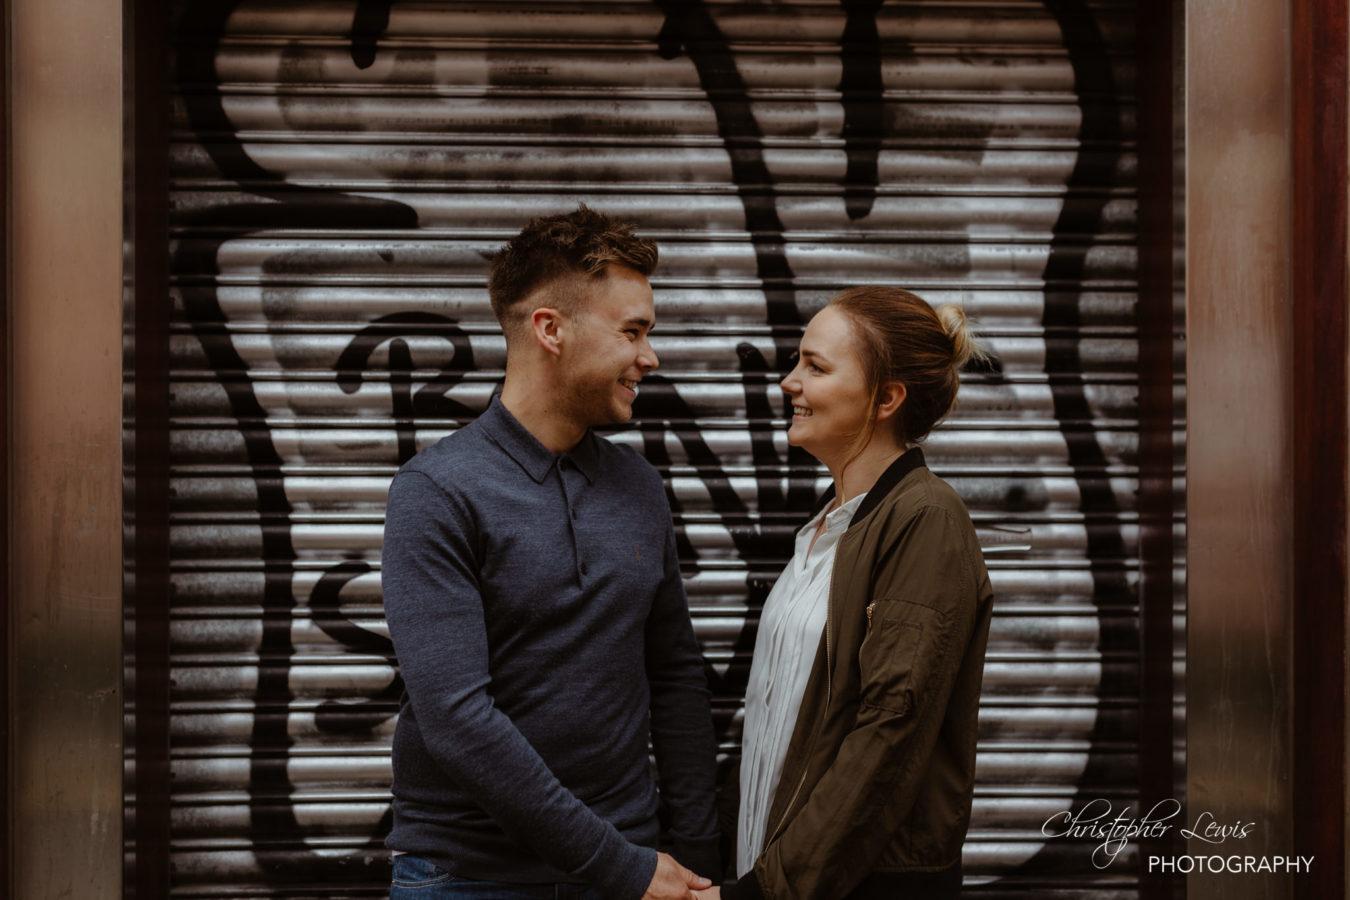 Northern-Quarter-Manchester-Pre-Wedding-Photoshoot-29